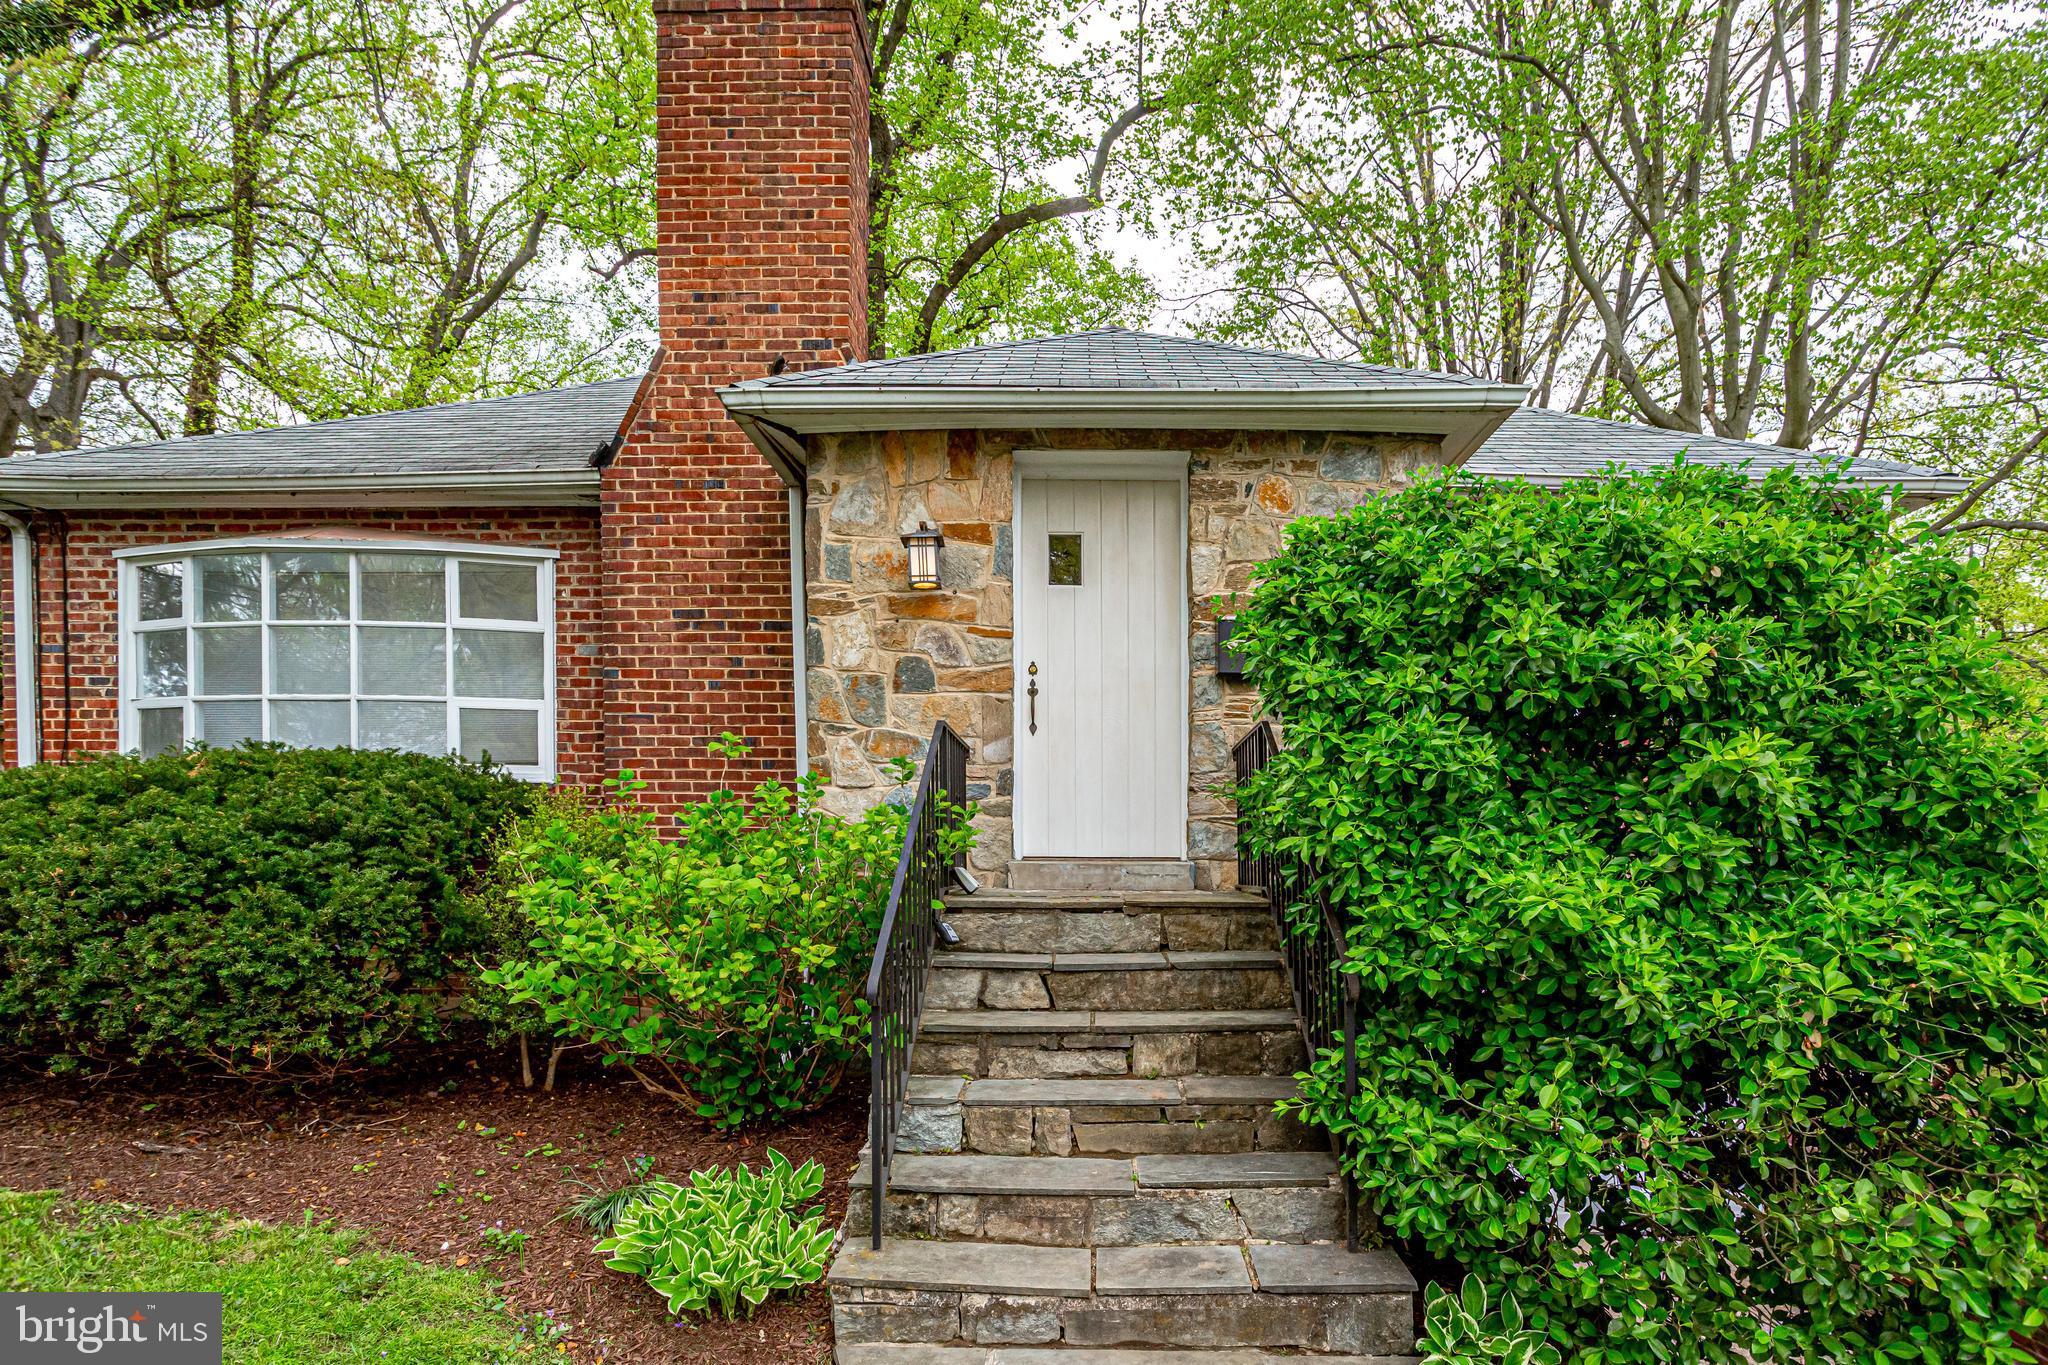 8905 WALDEN ROAD, SILVER SPRING, Maryland 20901, 3 Bedrooms Bedrooms, ,2 BathroomsBathrooms,Single Family,For Sale,8905 WALDEN ROAD,MDMC753164